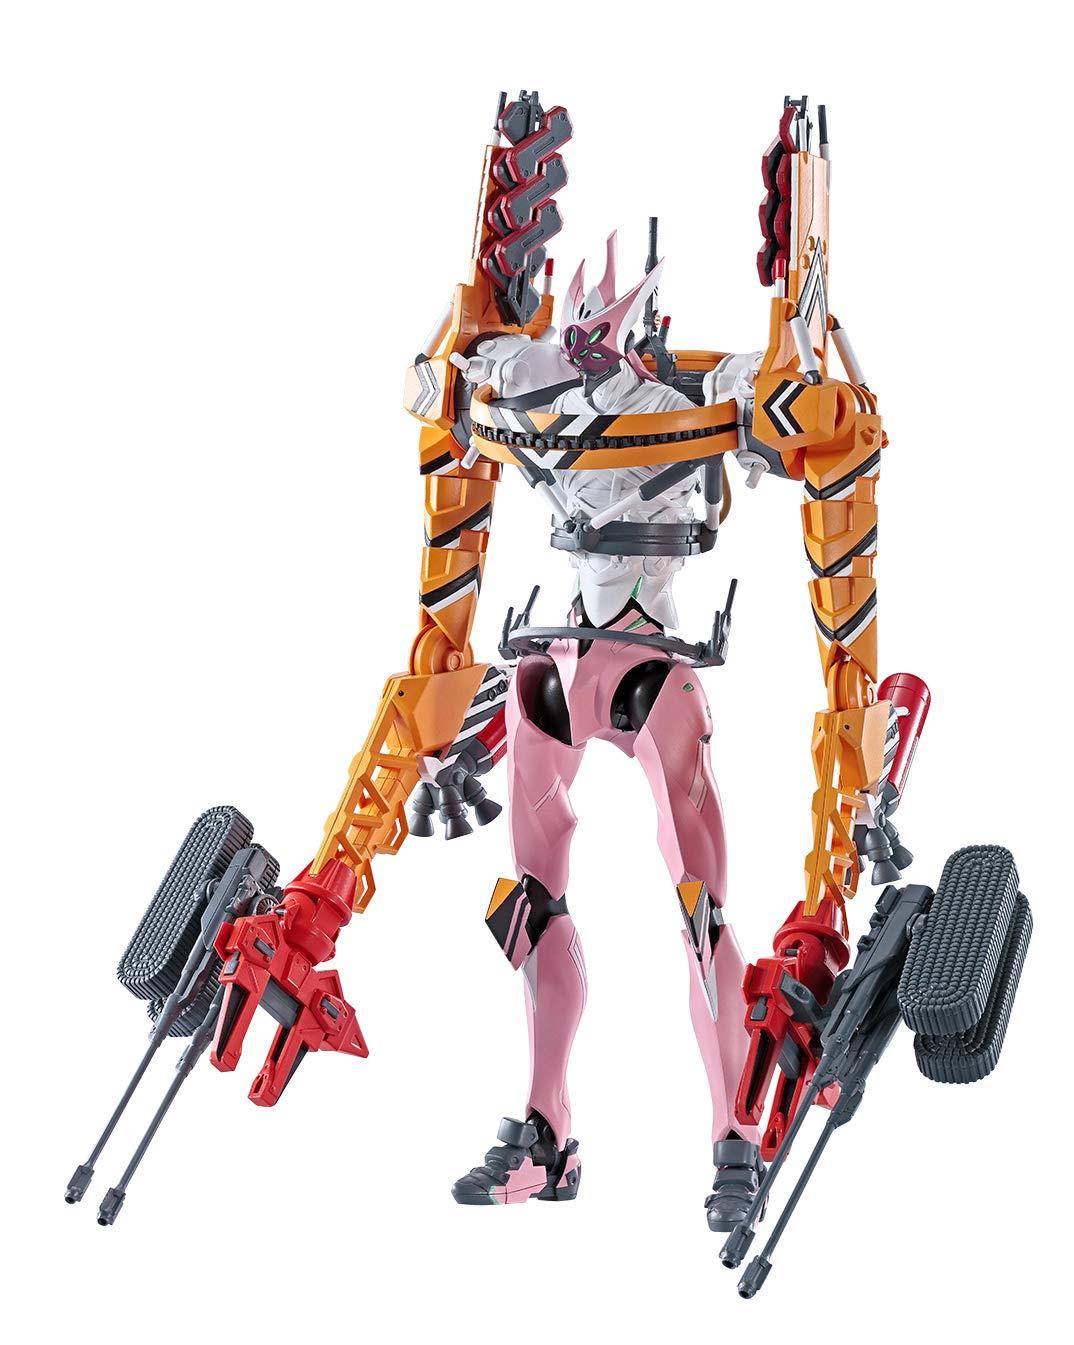 ROBOT魂 エヴァンゲリヲン [SIDE EVA] エヴァンゲリオン8号機β 臨時戦闘形態